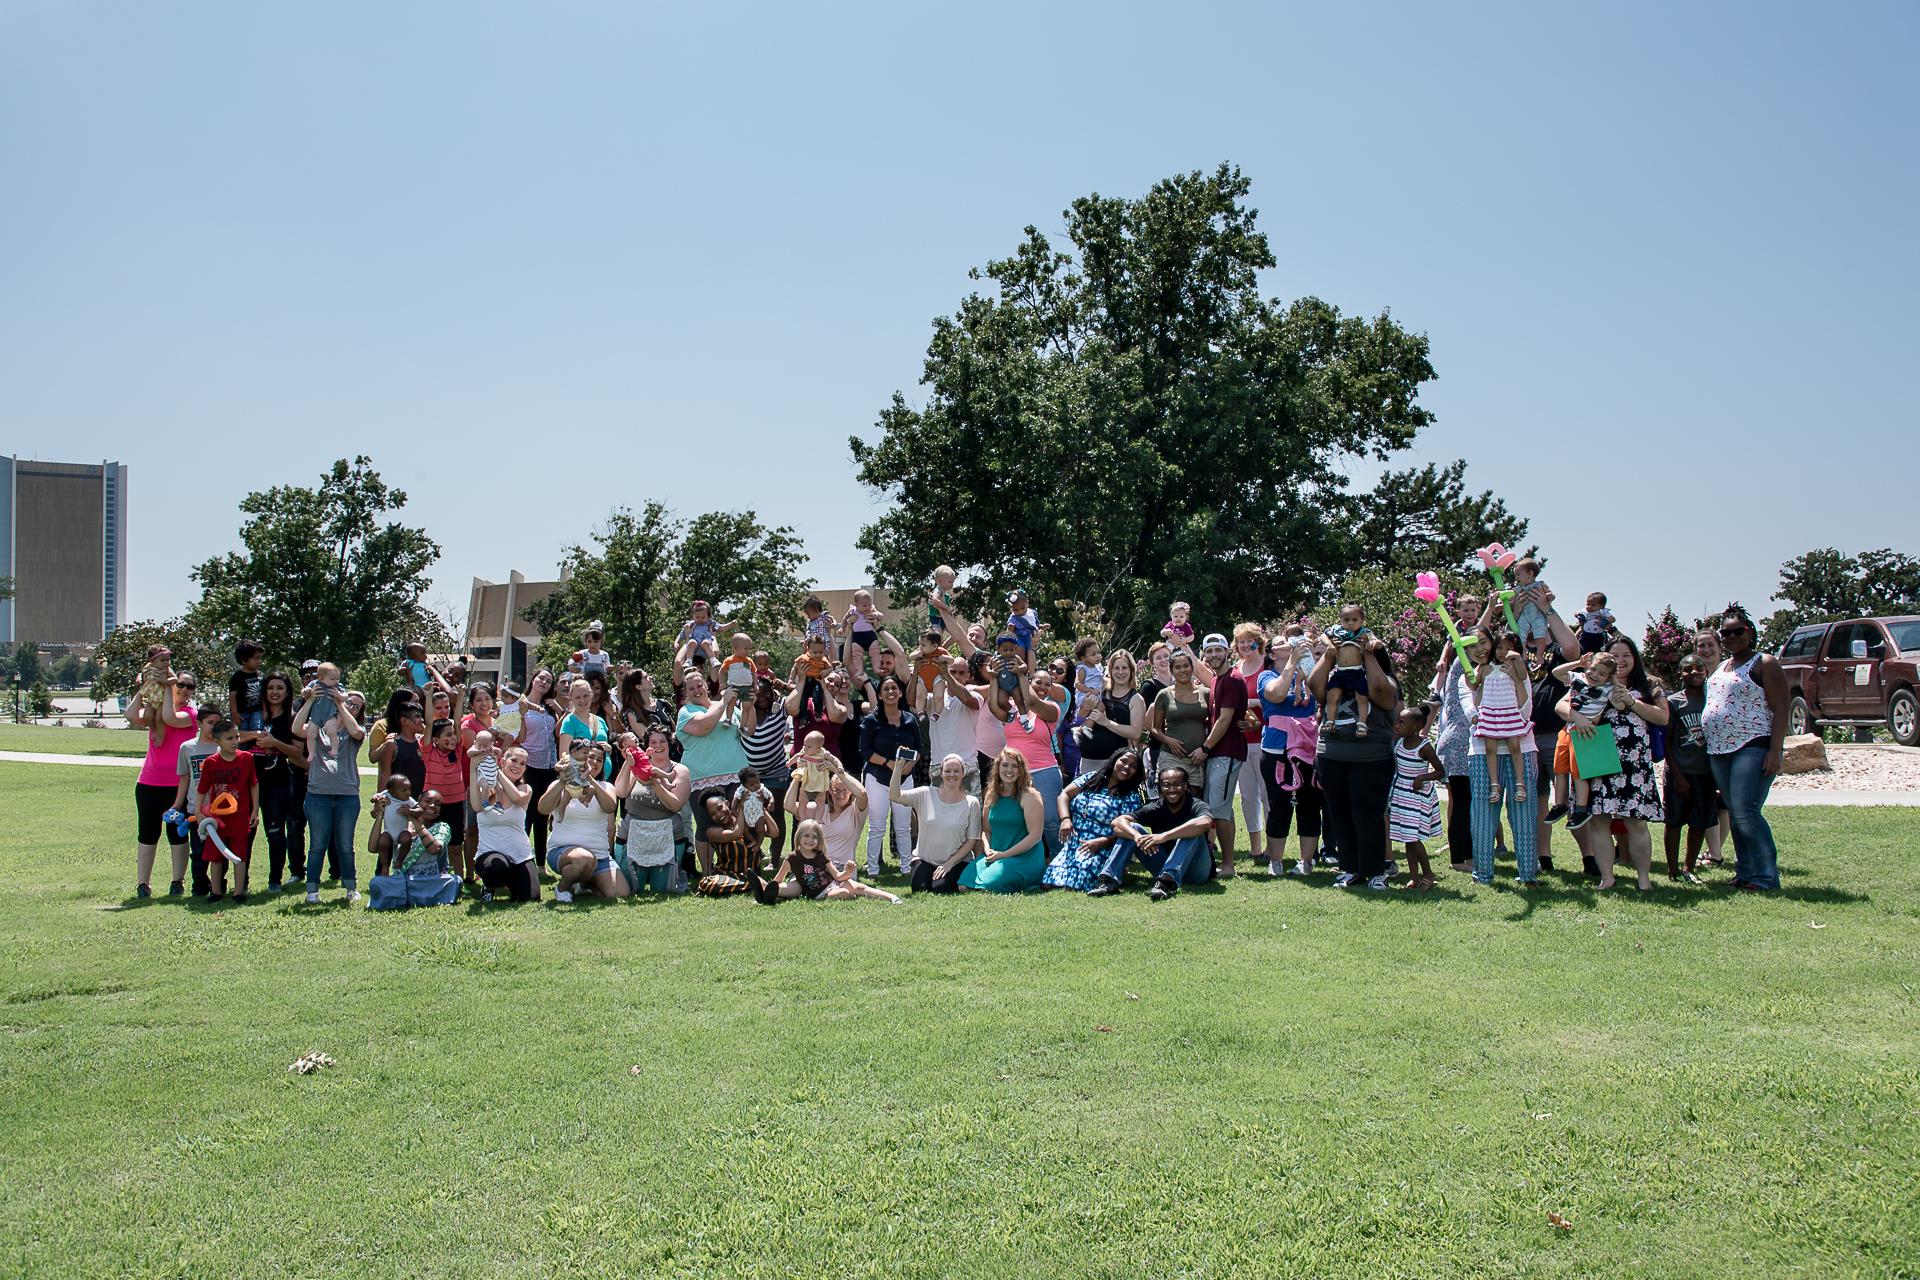 Tulsa-Oklahoma-Community-Black-Multi-Cultural-Breastfeeding-Wellness-Resources-Support.jpg